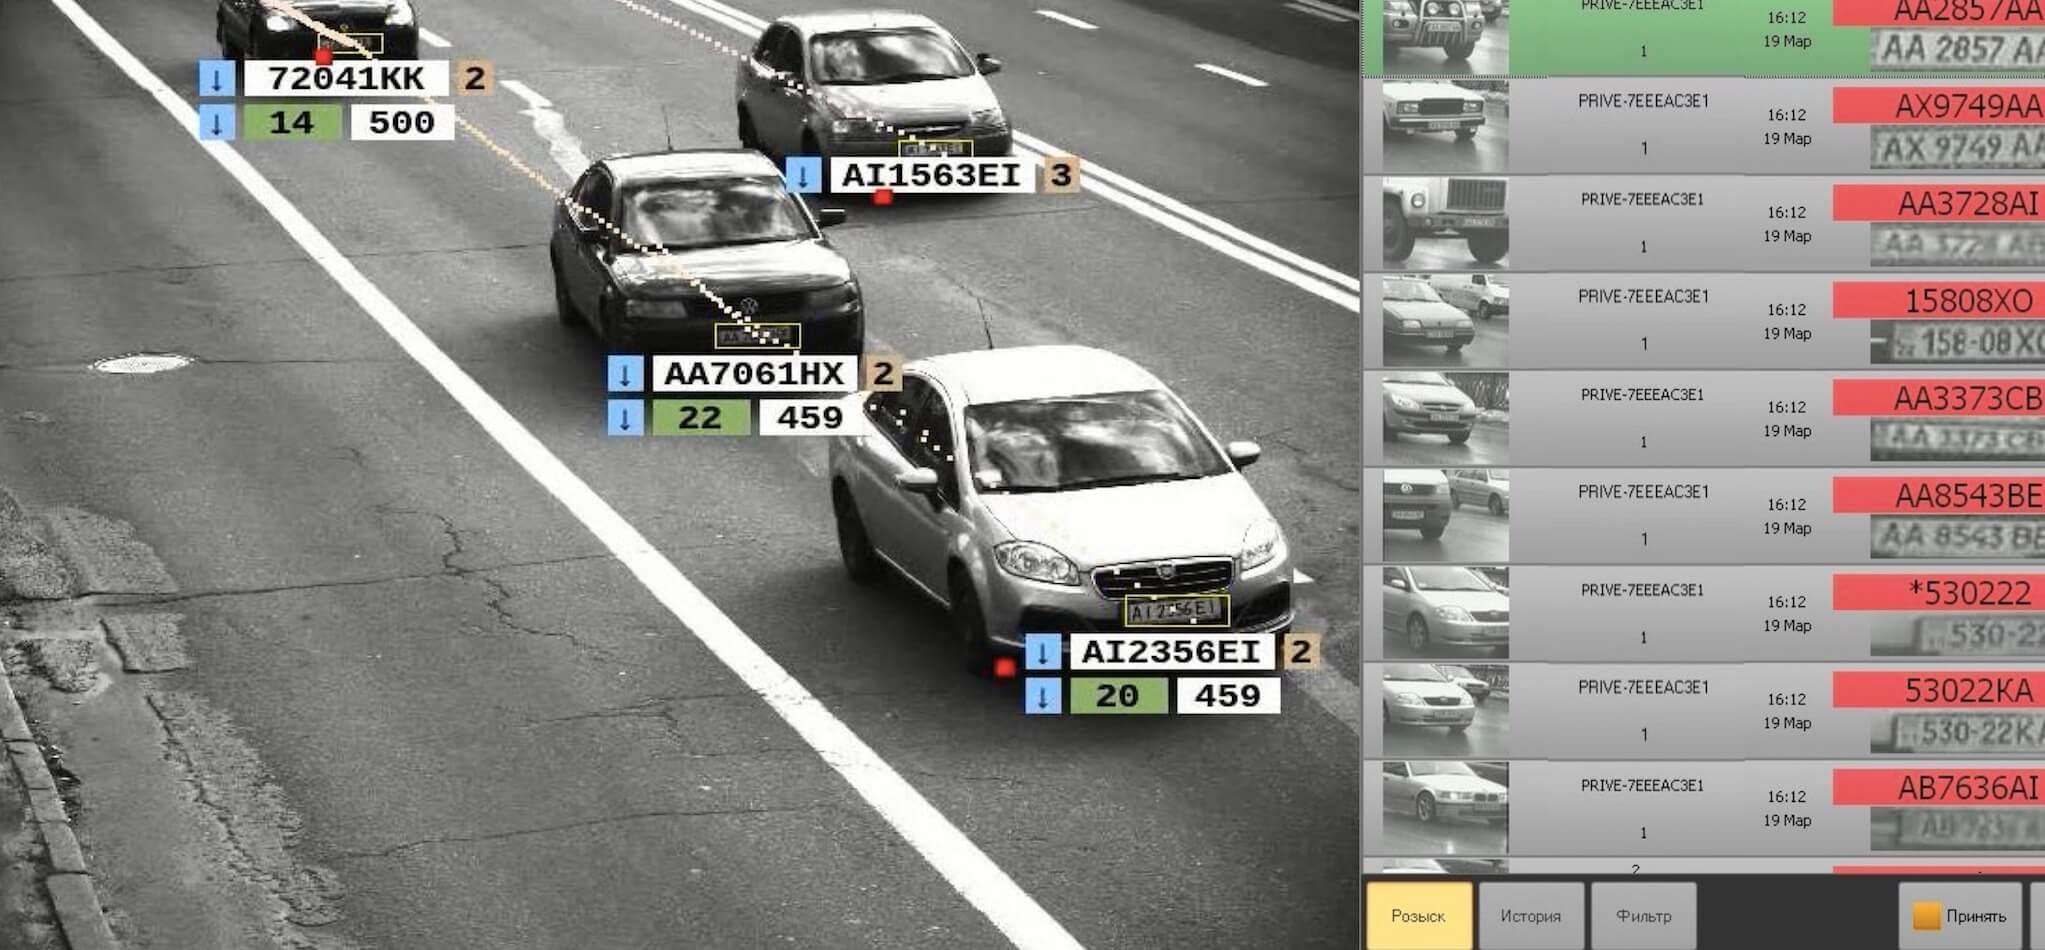 Распознавание номера автомобиля по фото